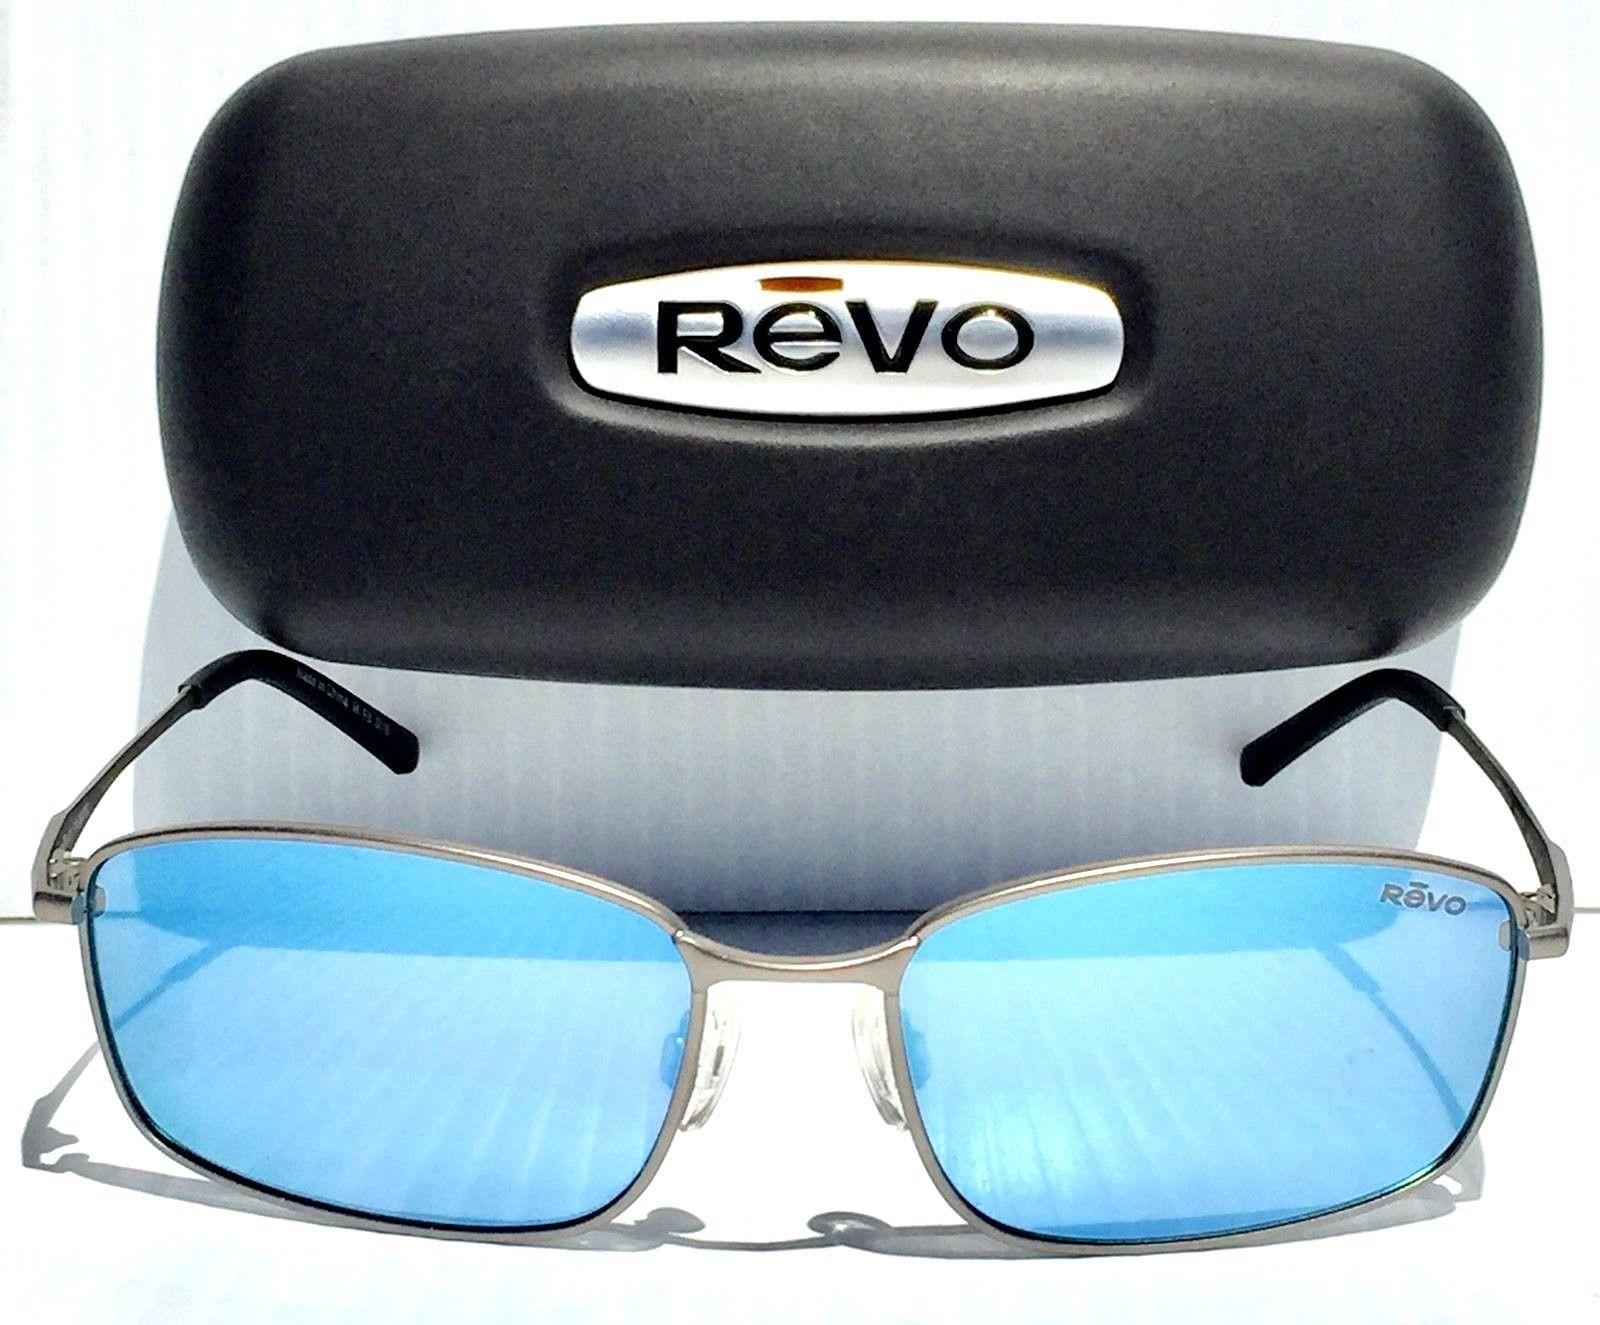 a10e293610596 NEW REVO SCOUT LEAD Satin Wire w POLARIZED Blue water Lens Sunglass RE 5004  BL (eBay Link)